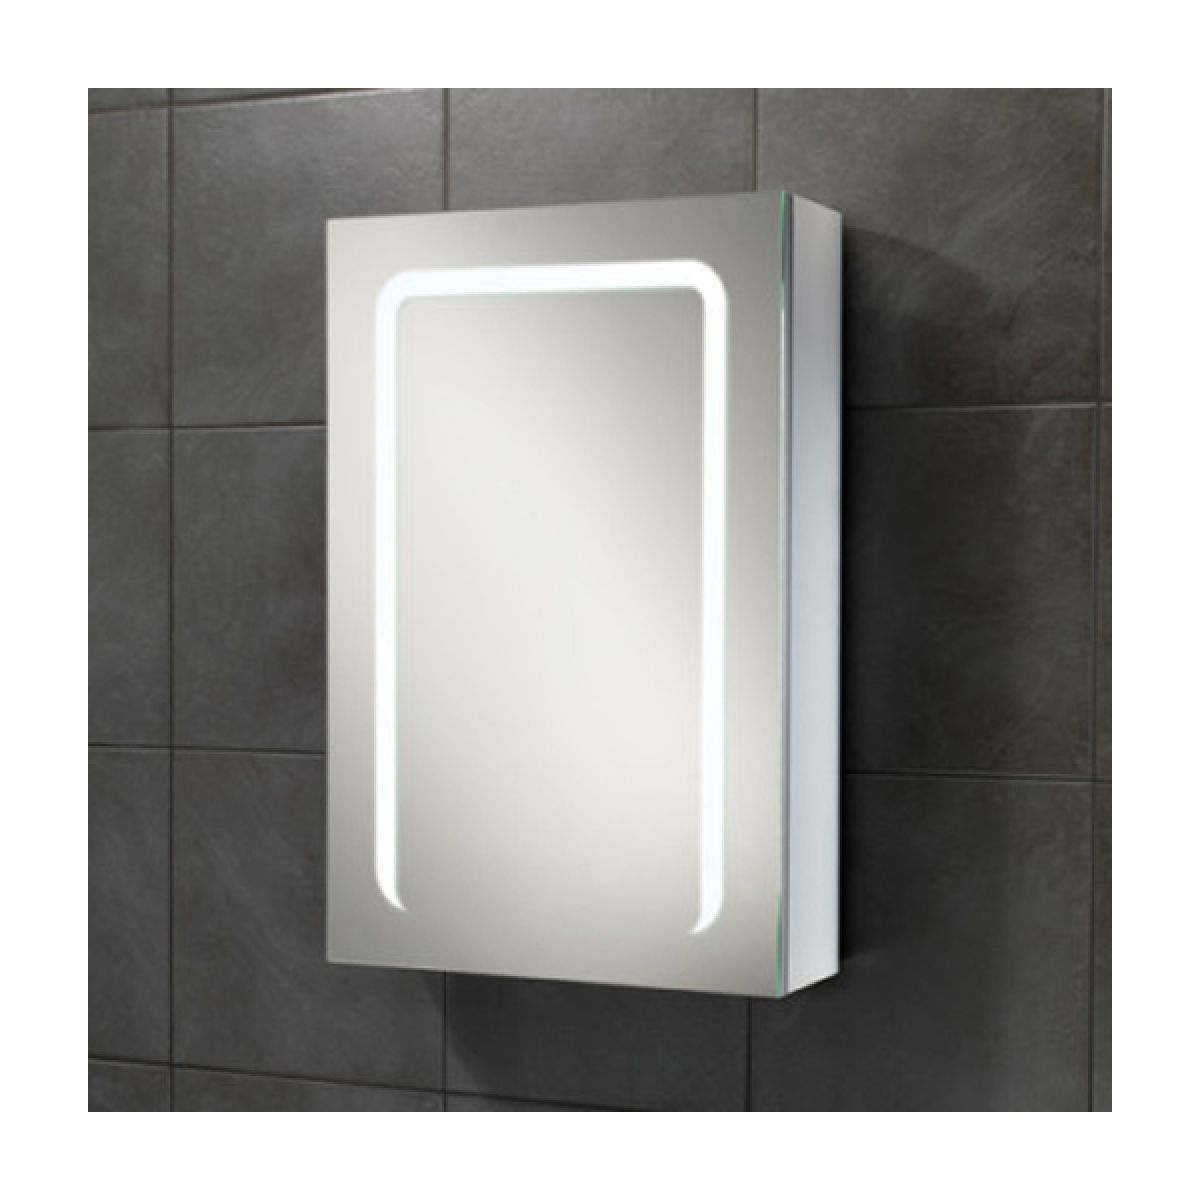 HiB Stratus 50 LED Single Door Cabinet